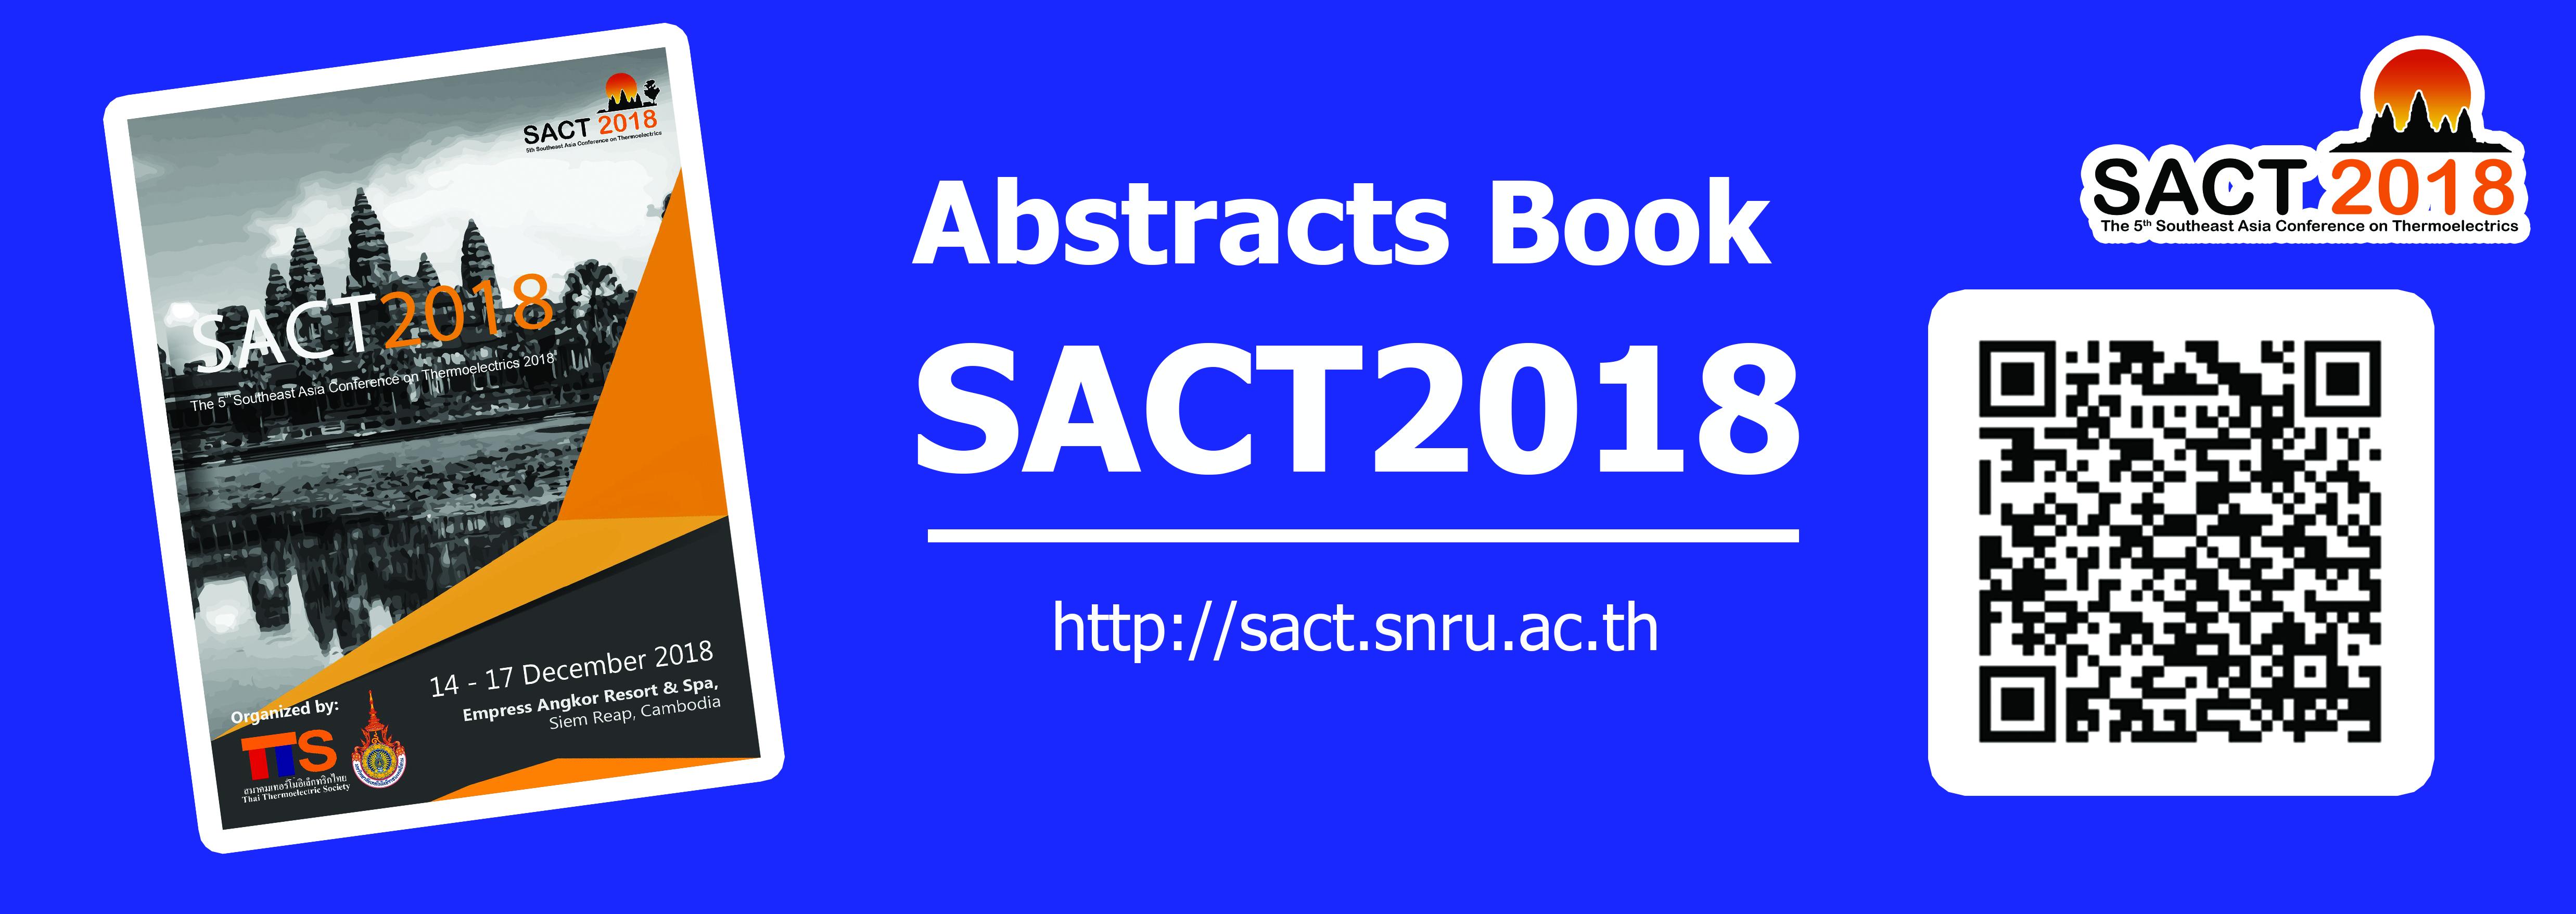 Abstract Book SACT2018